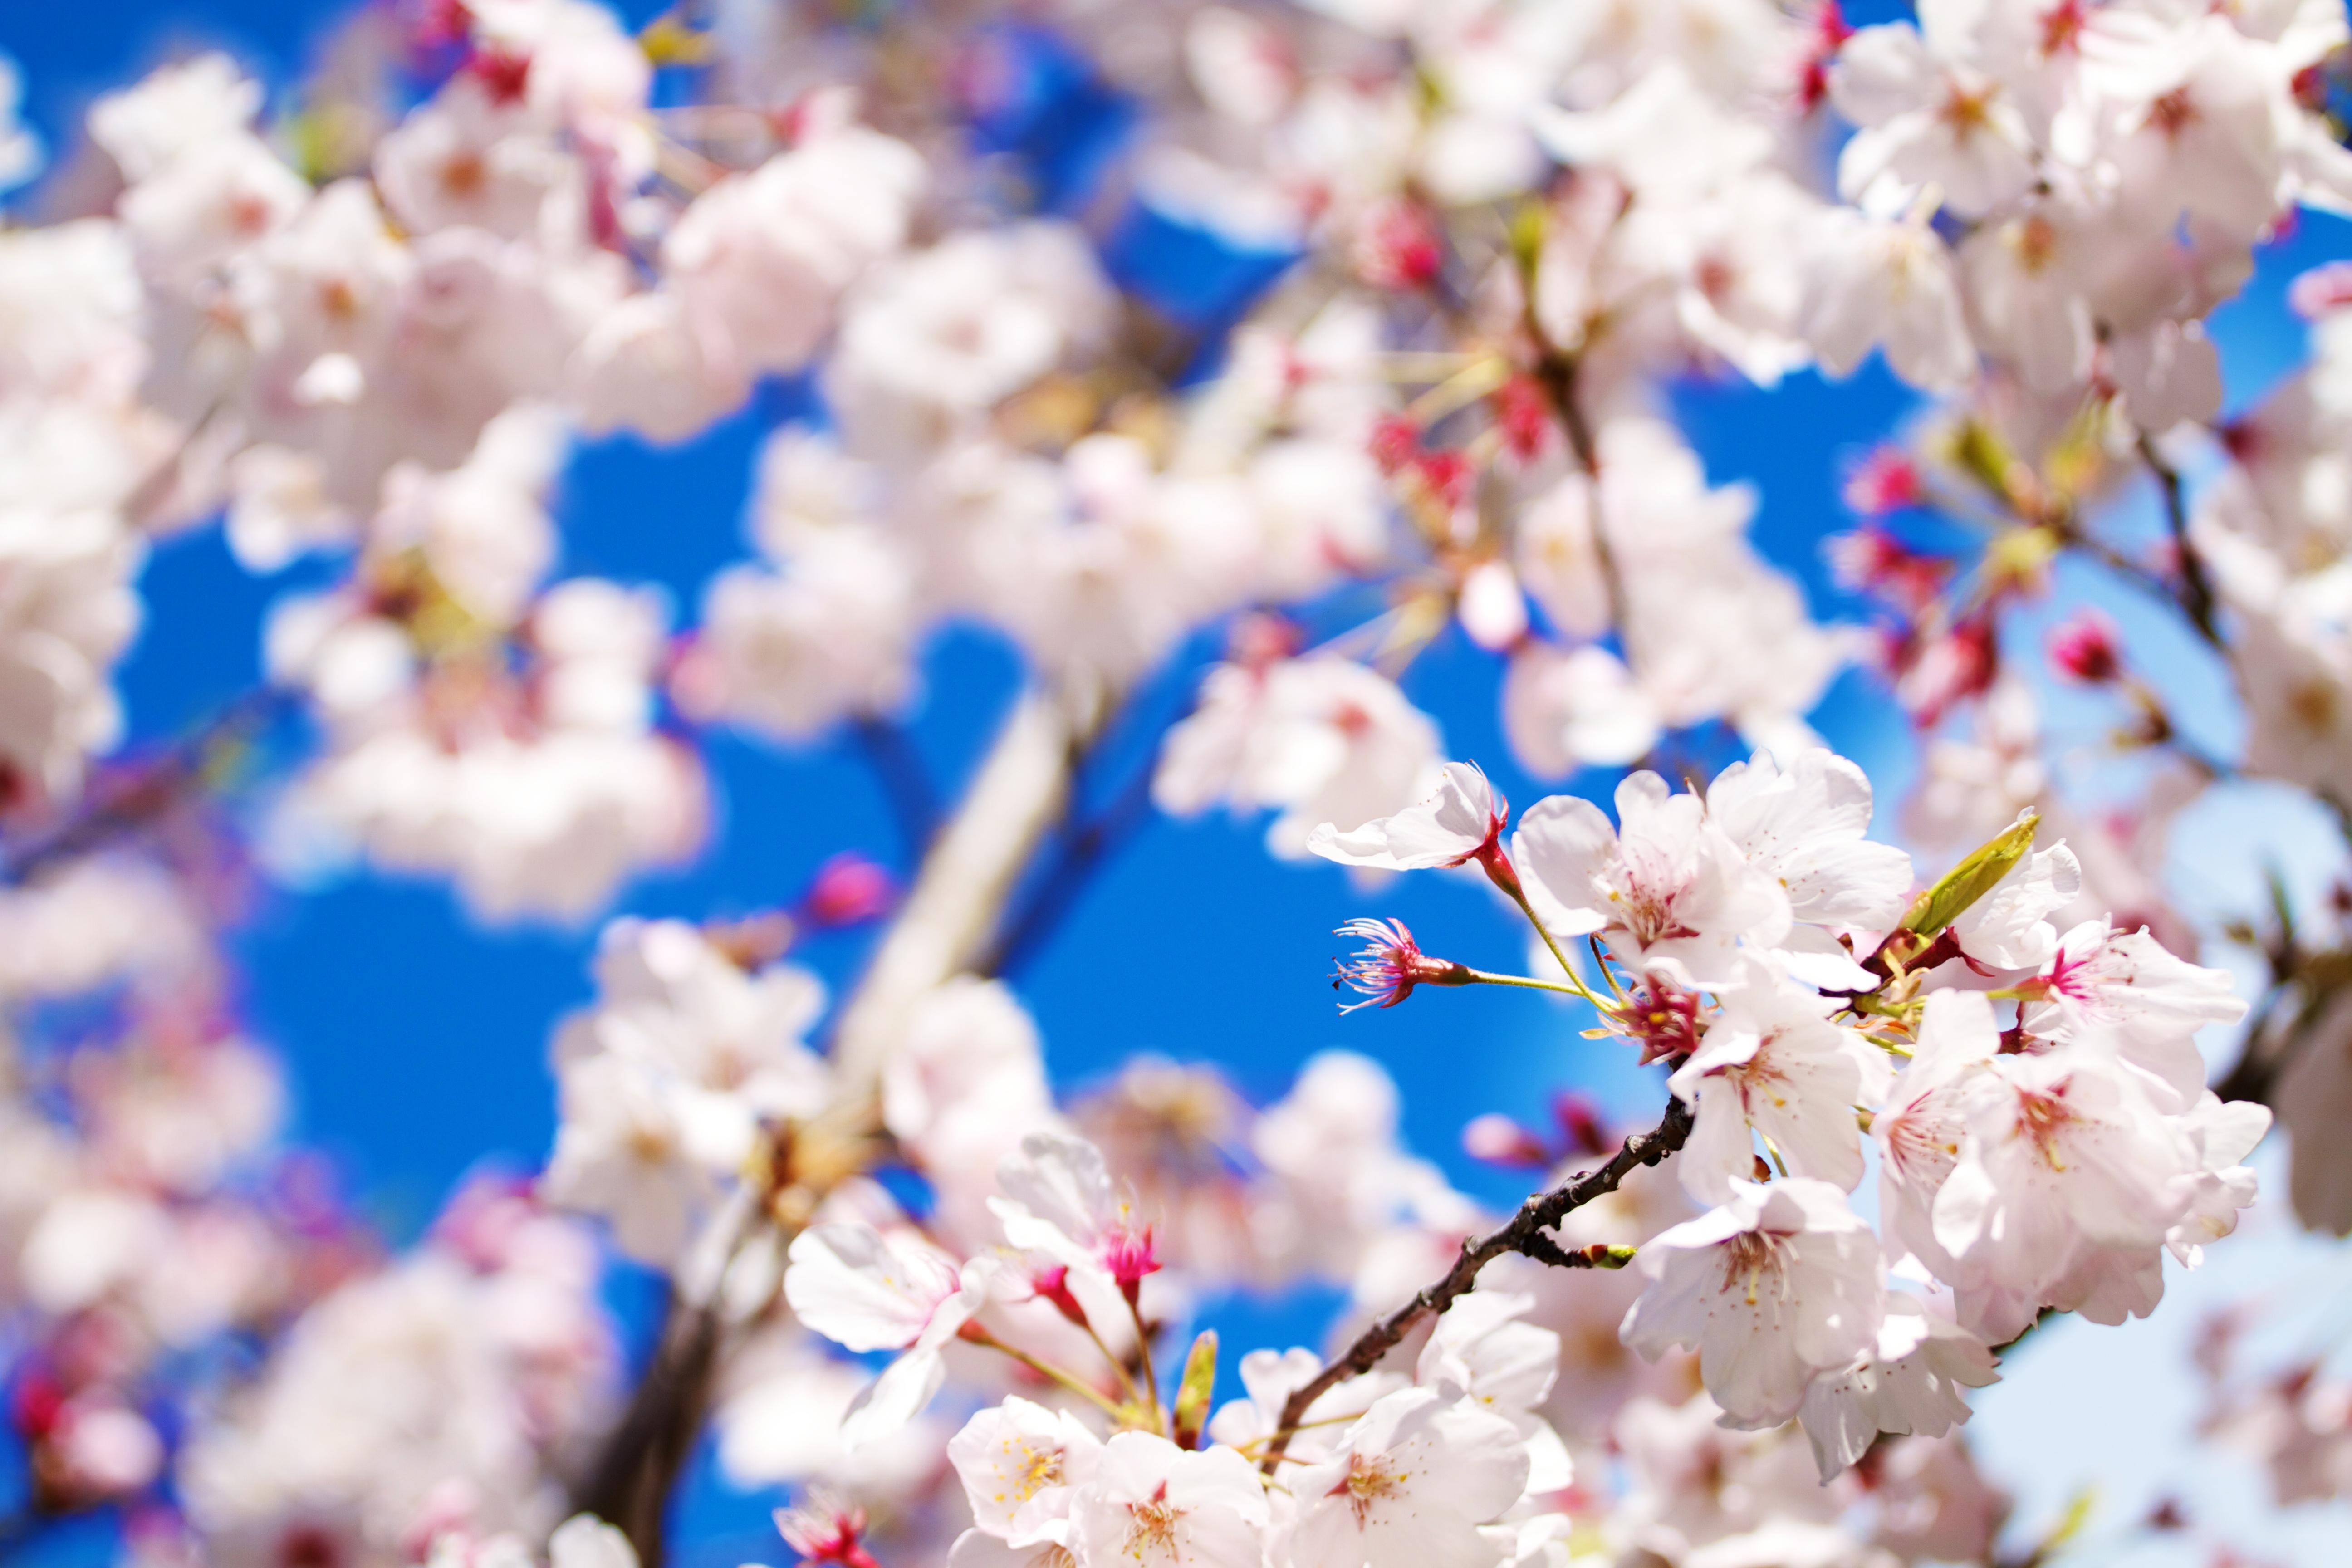 Pretty Flowers Tumblr Dress Images